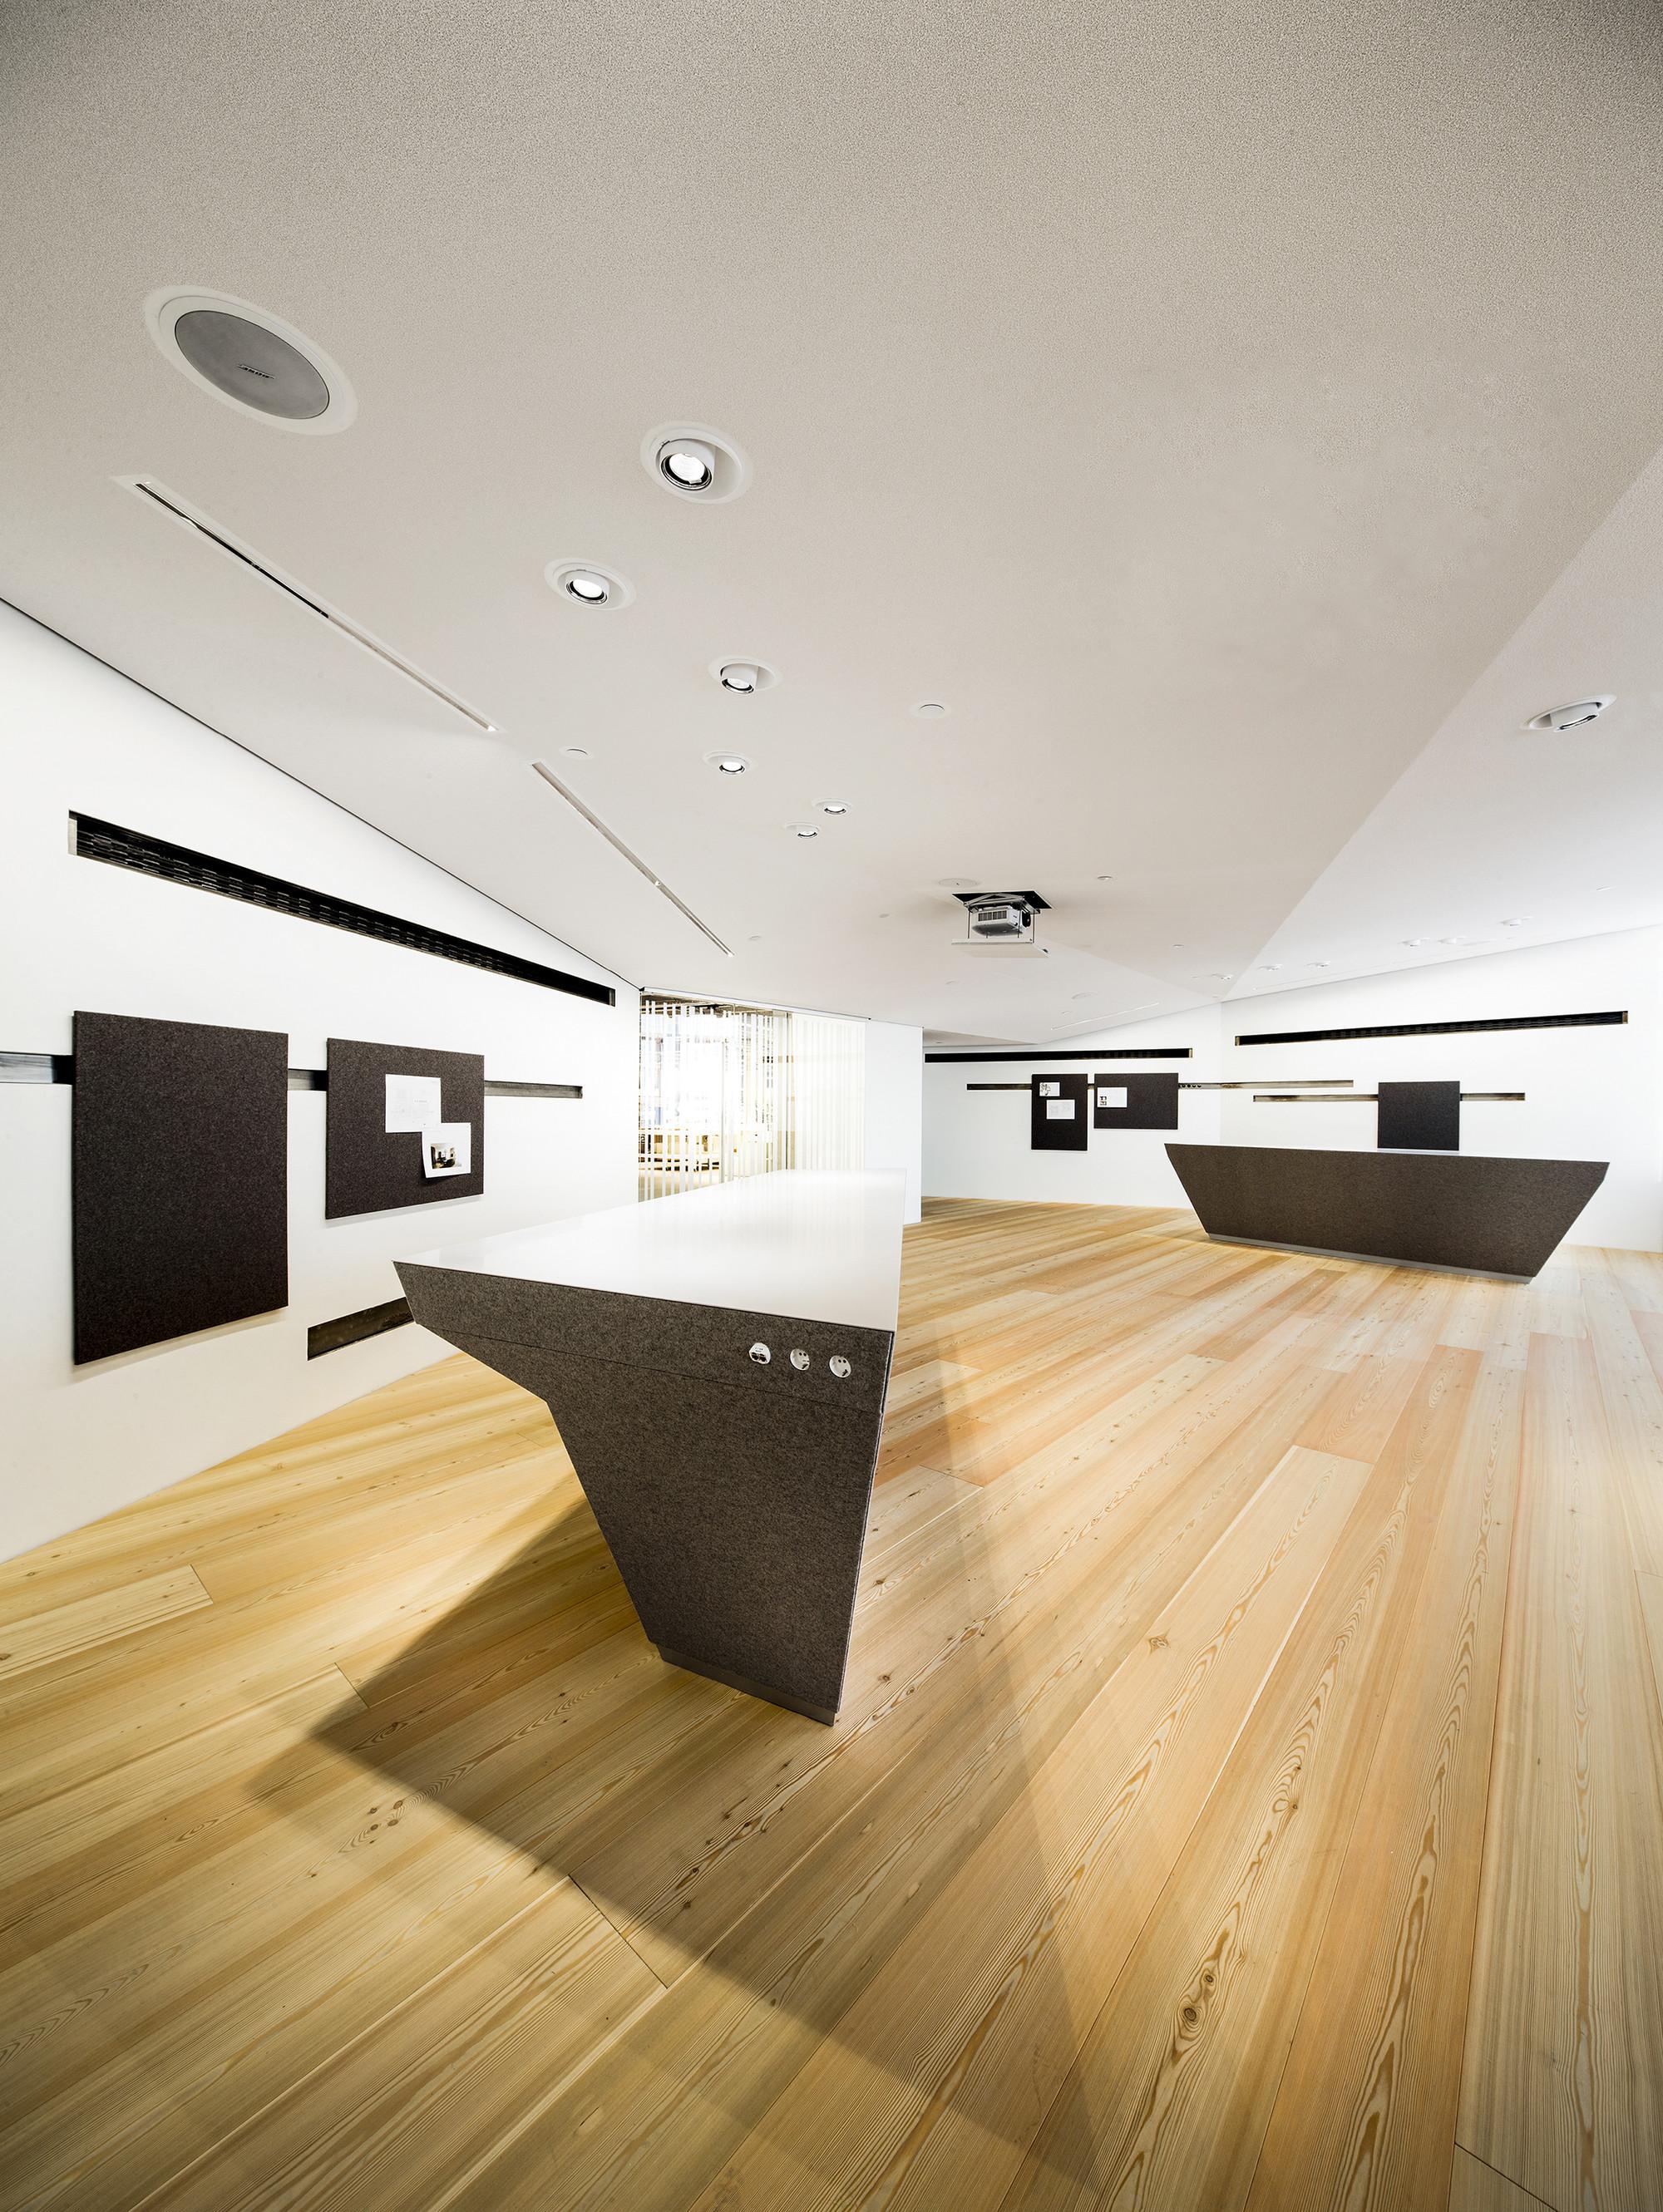 Gallery of kreativlabs sch ne r ume architektur for Architektur innenarchitektur